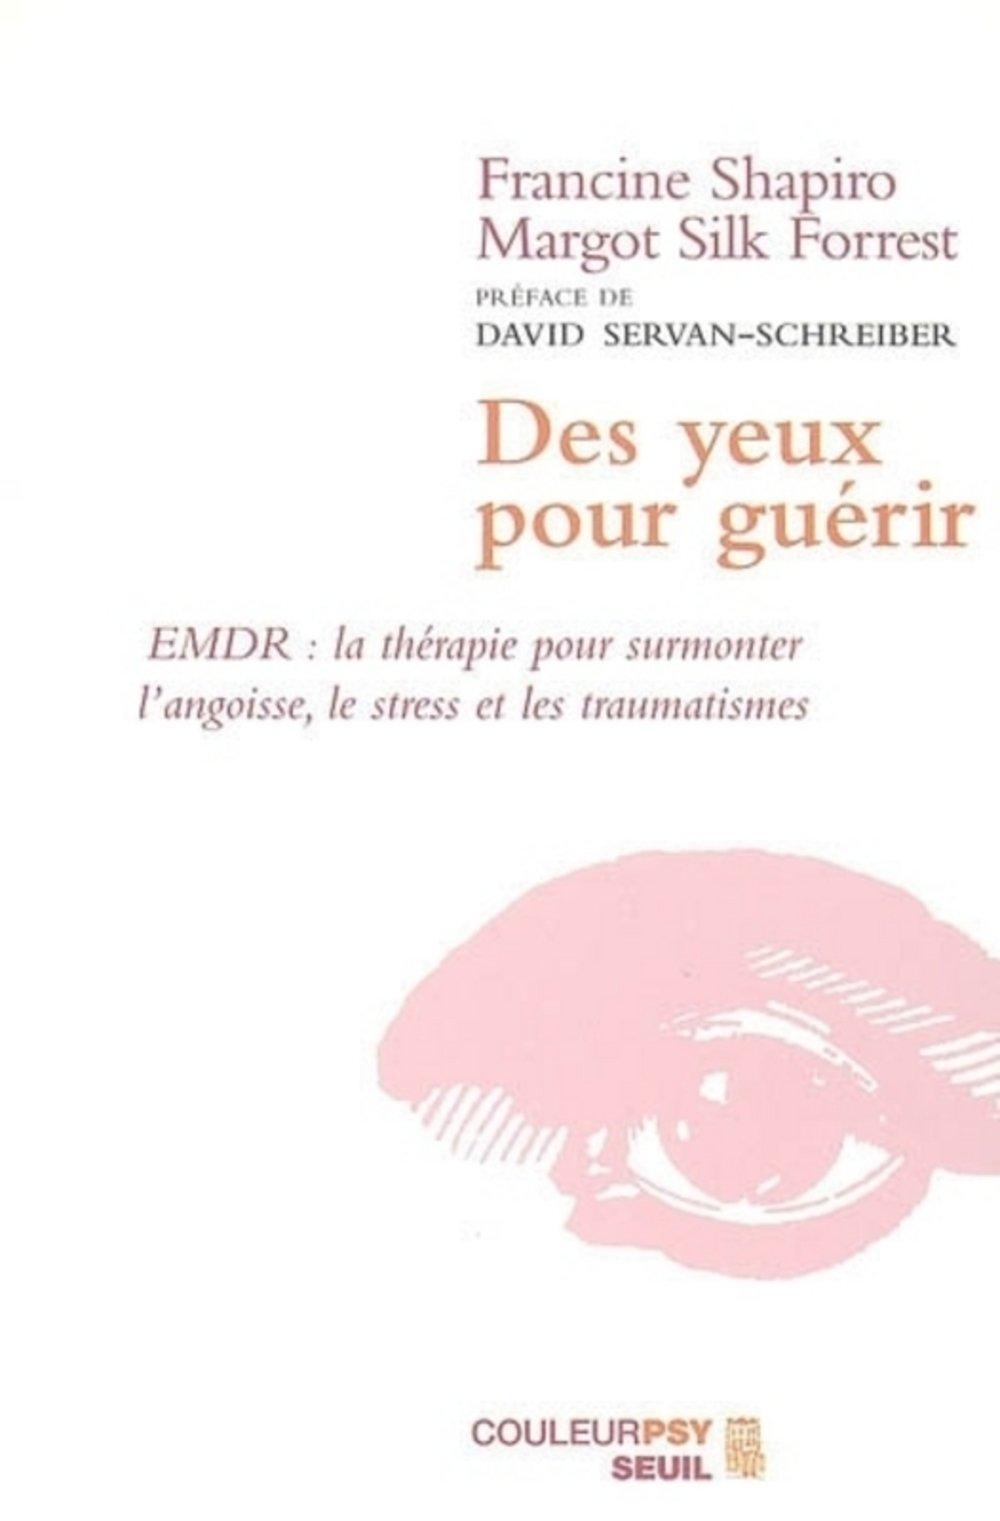 Des Yeux Pour Gua C Rir Emdr French Edition Francine Shapiro Margot Silk Forrest 9782020637442 Amazon Com Books